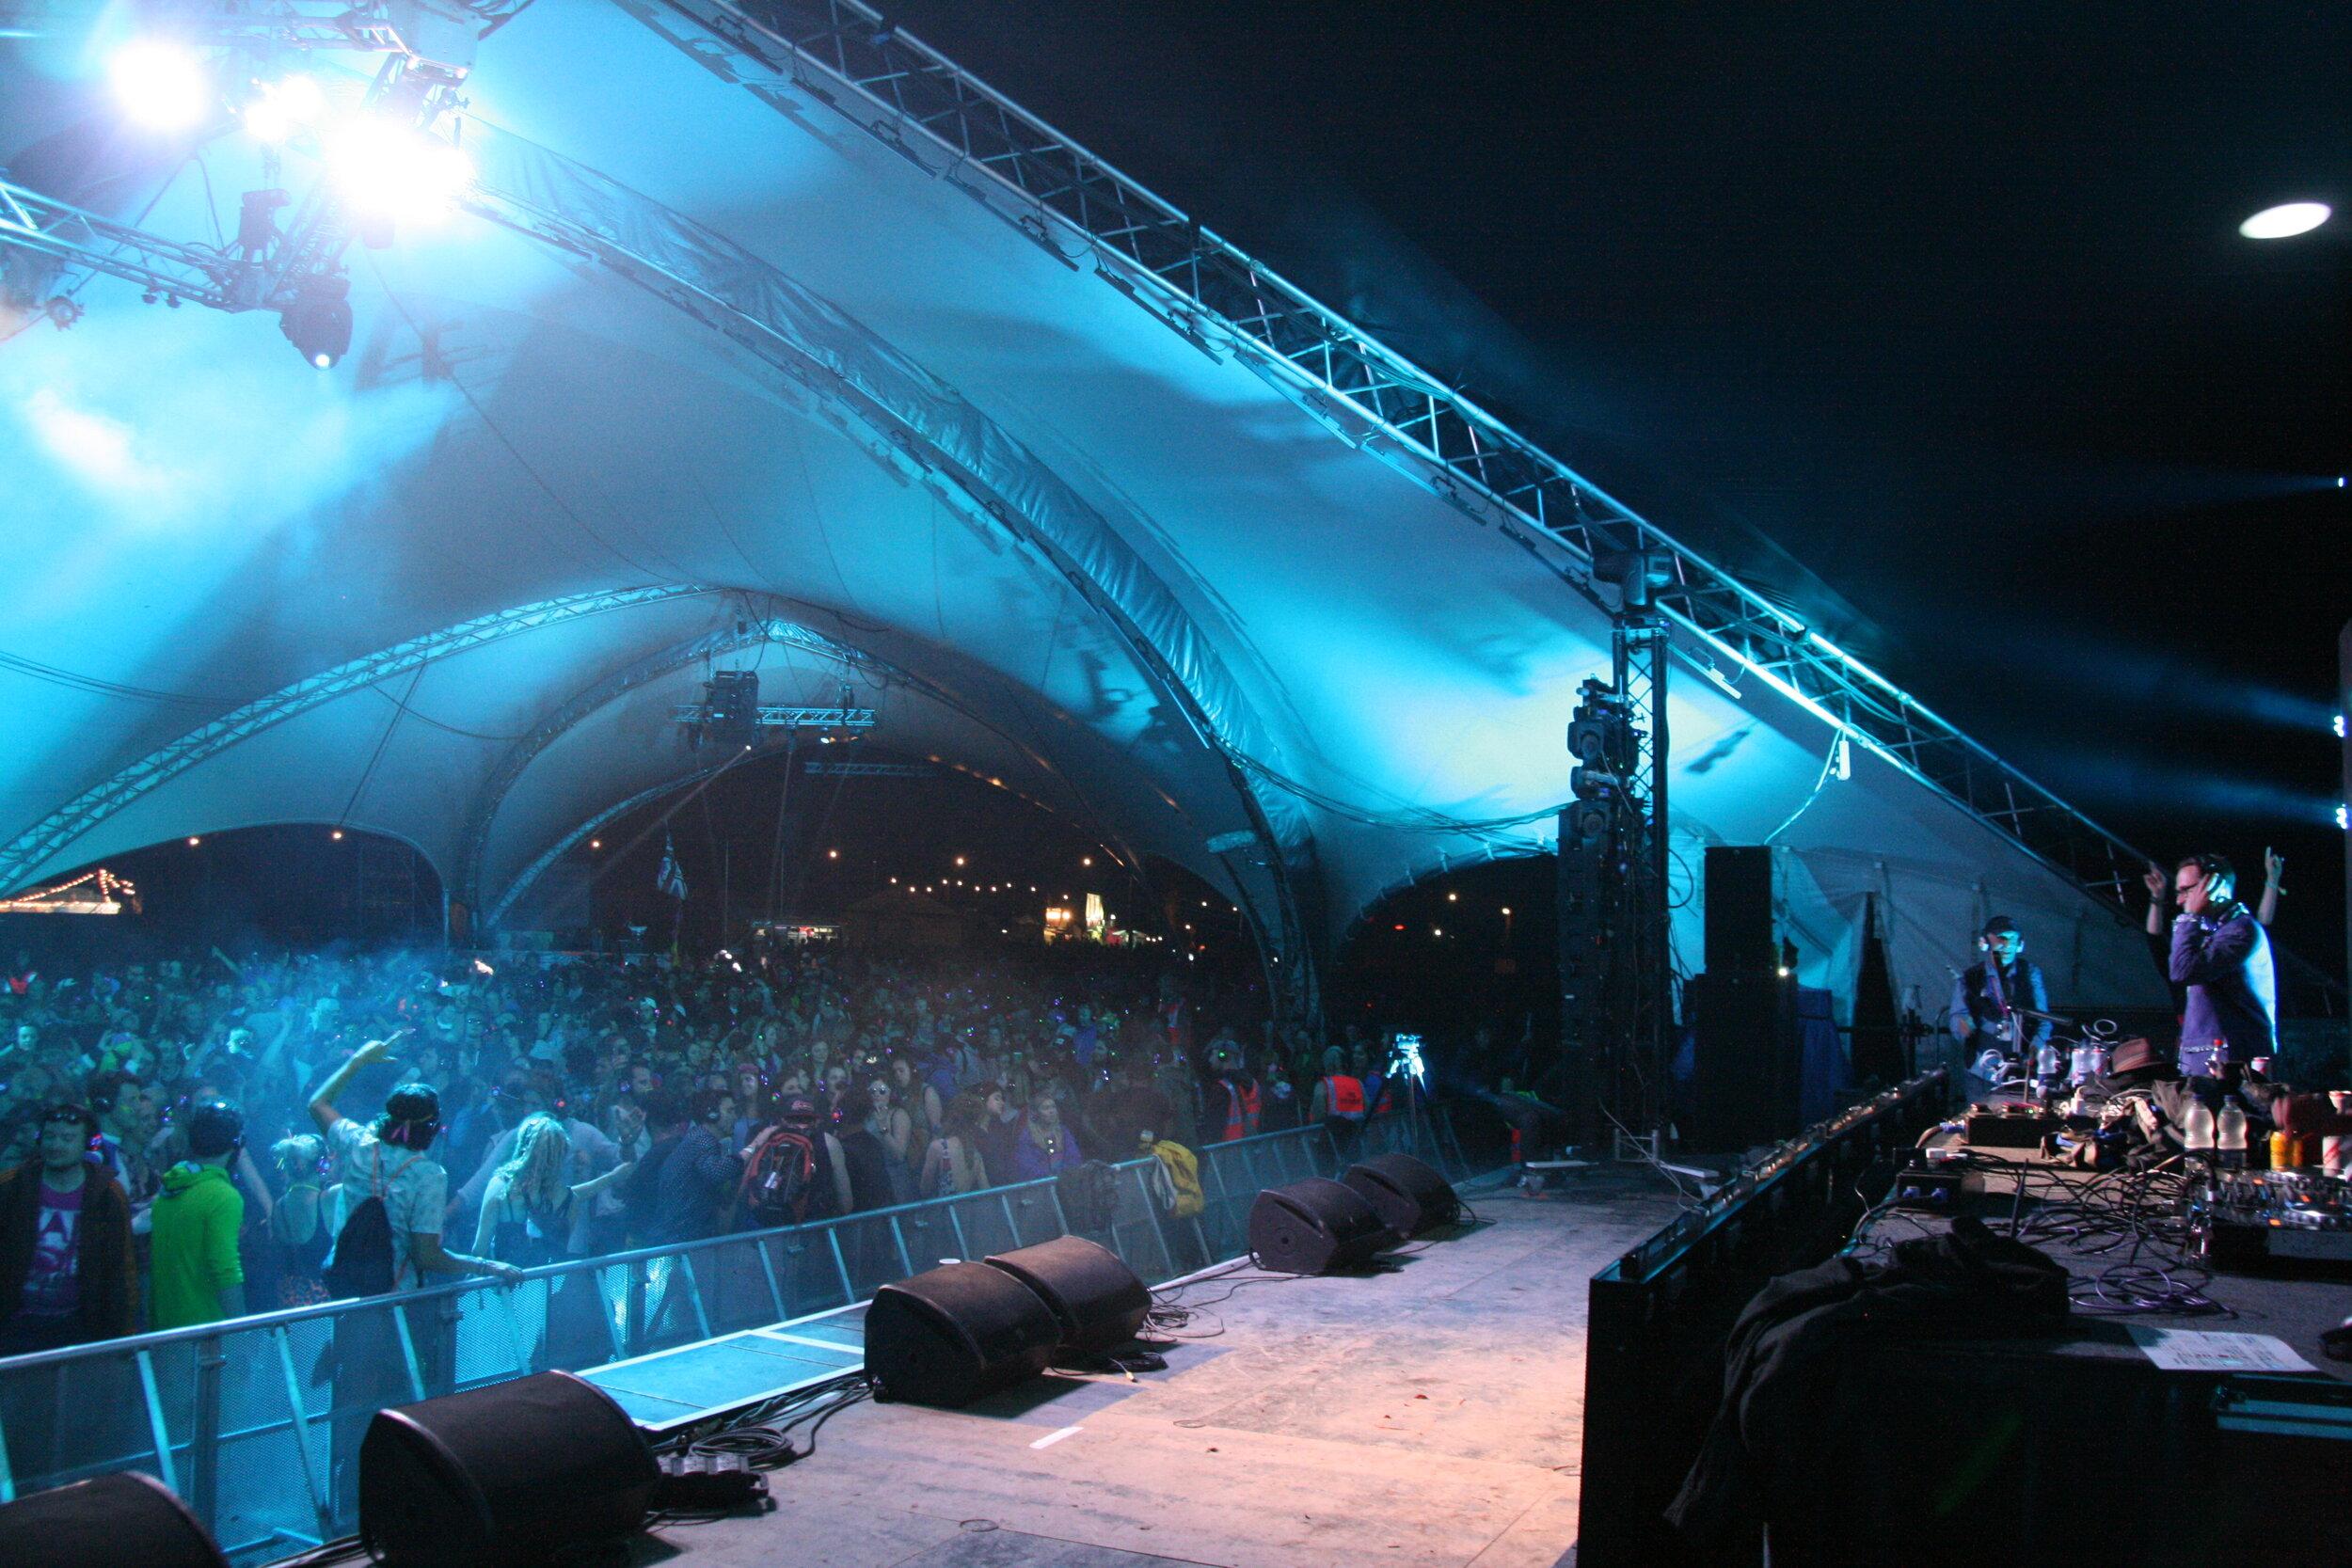 DJ Reverend Turner Glasto 16 Heds Party 5000 people (Bio pic 3).JPG